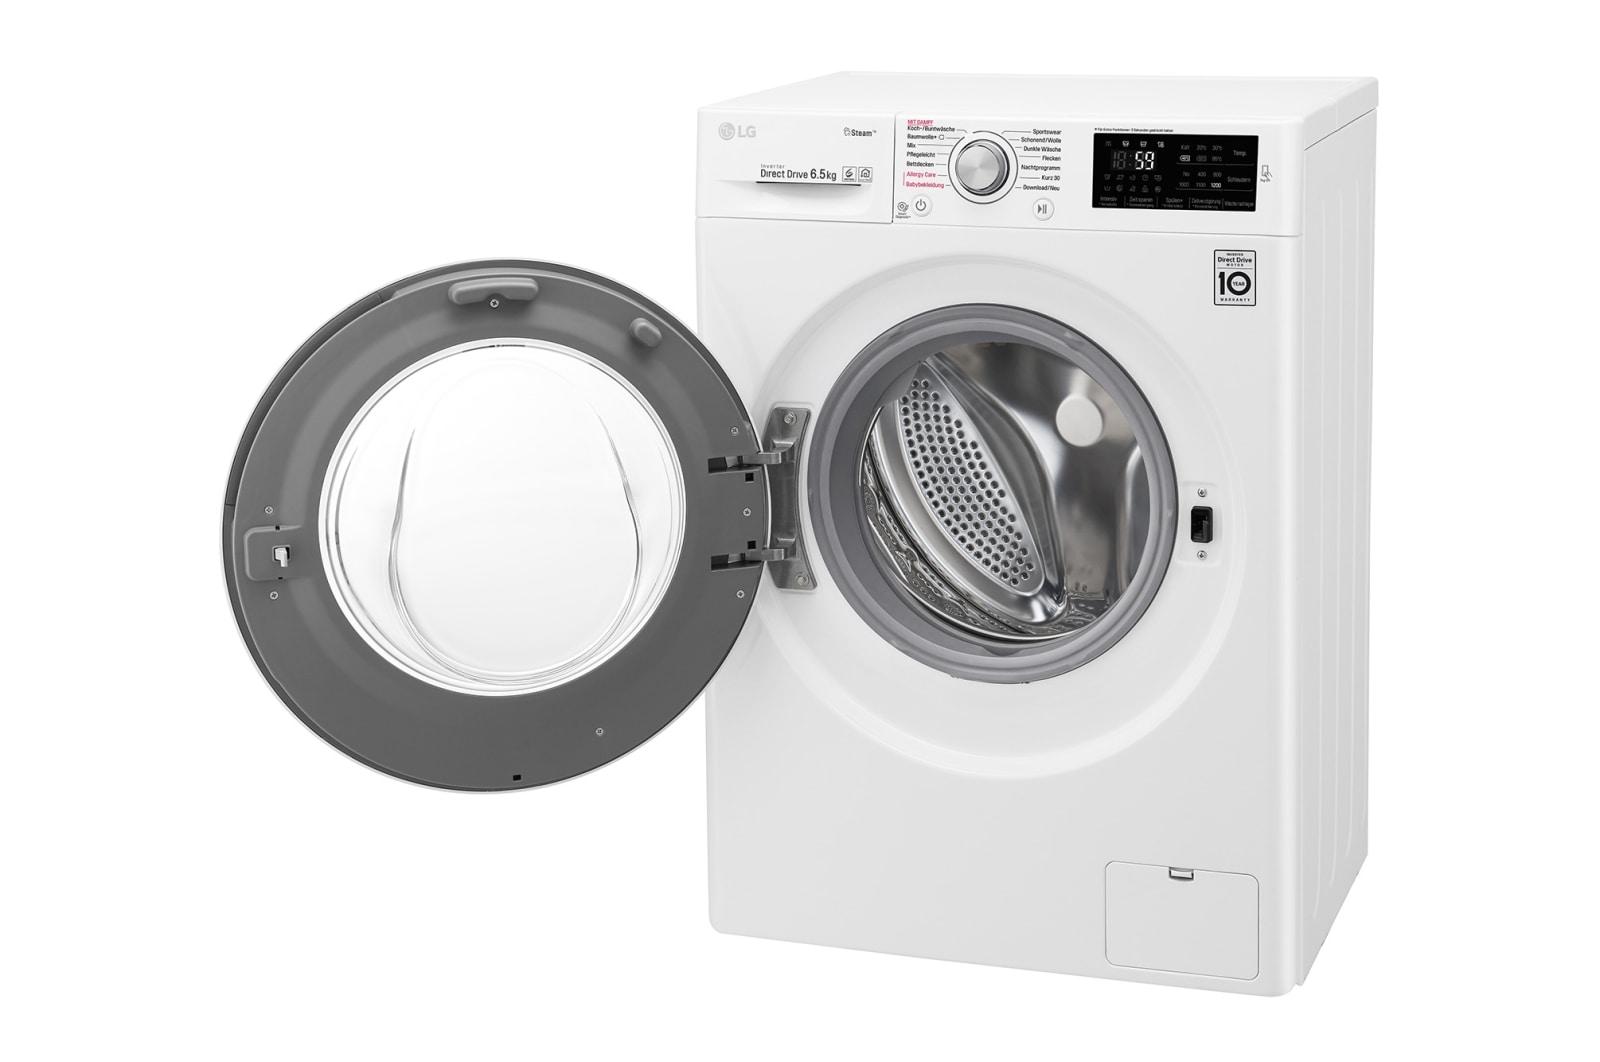 Lg waschvollautomat i nur 45cm tiefe i dampffunktion i nfc